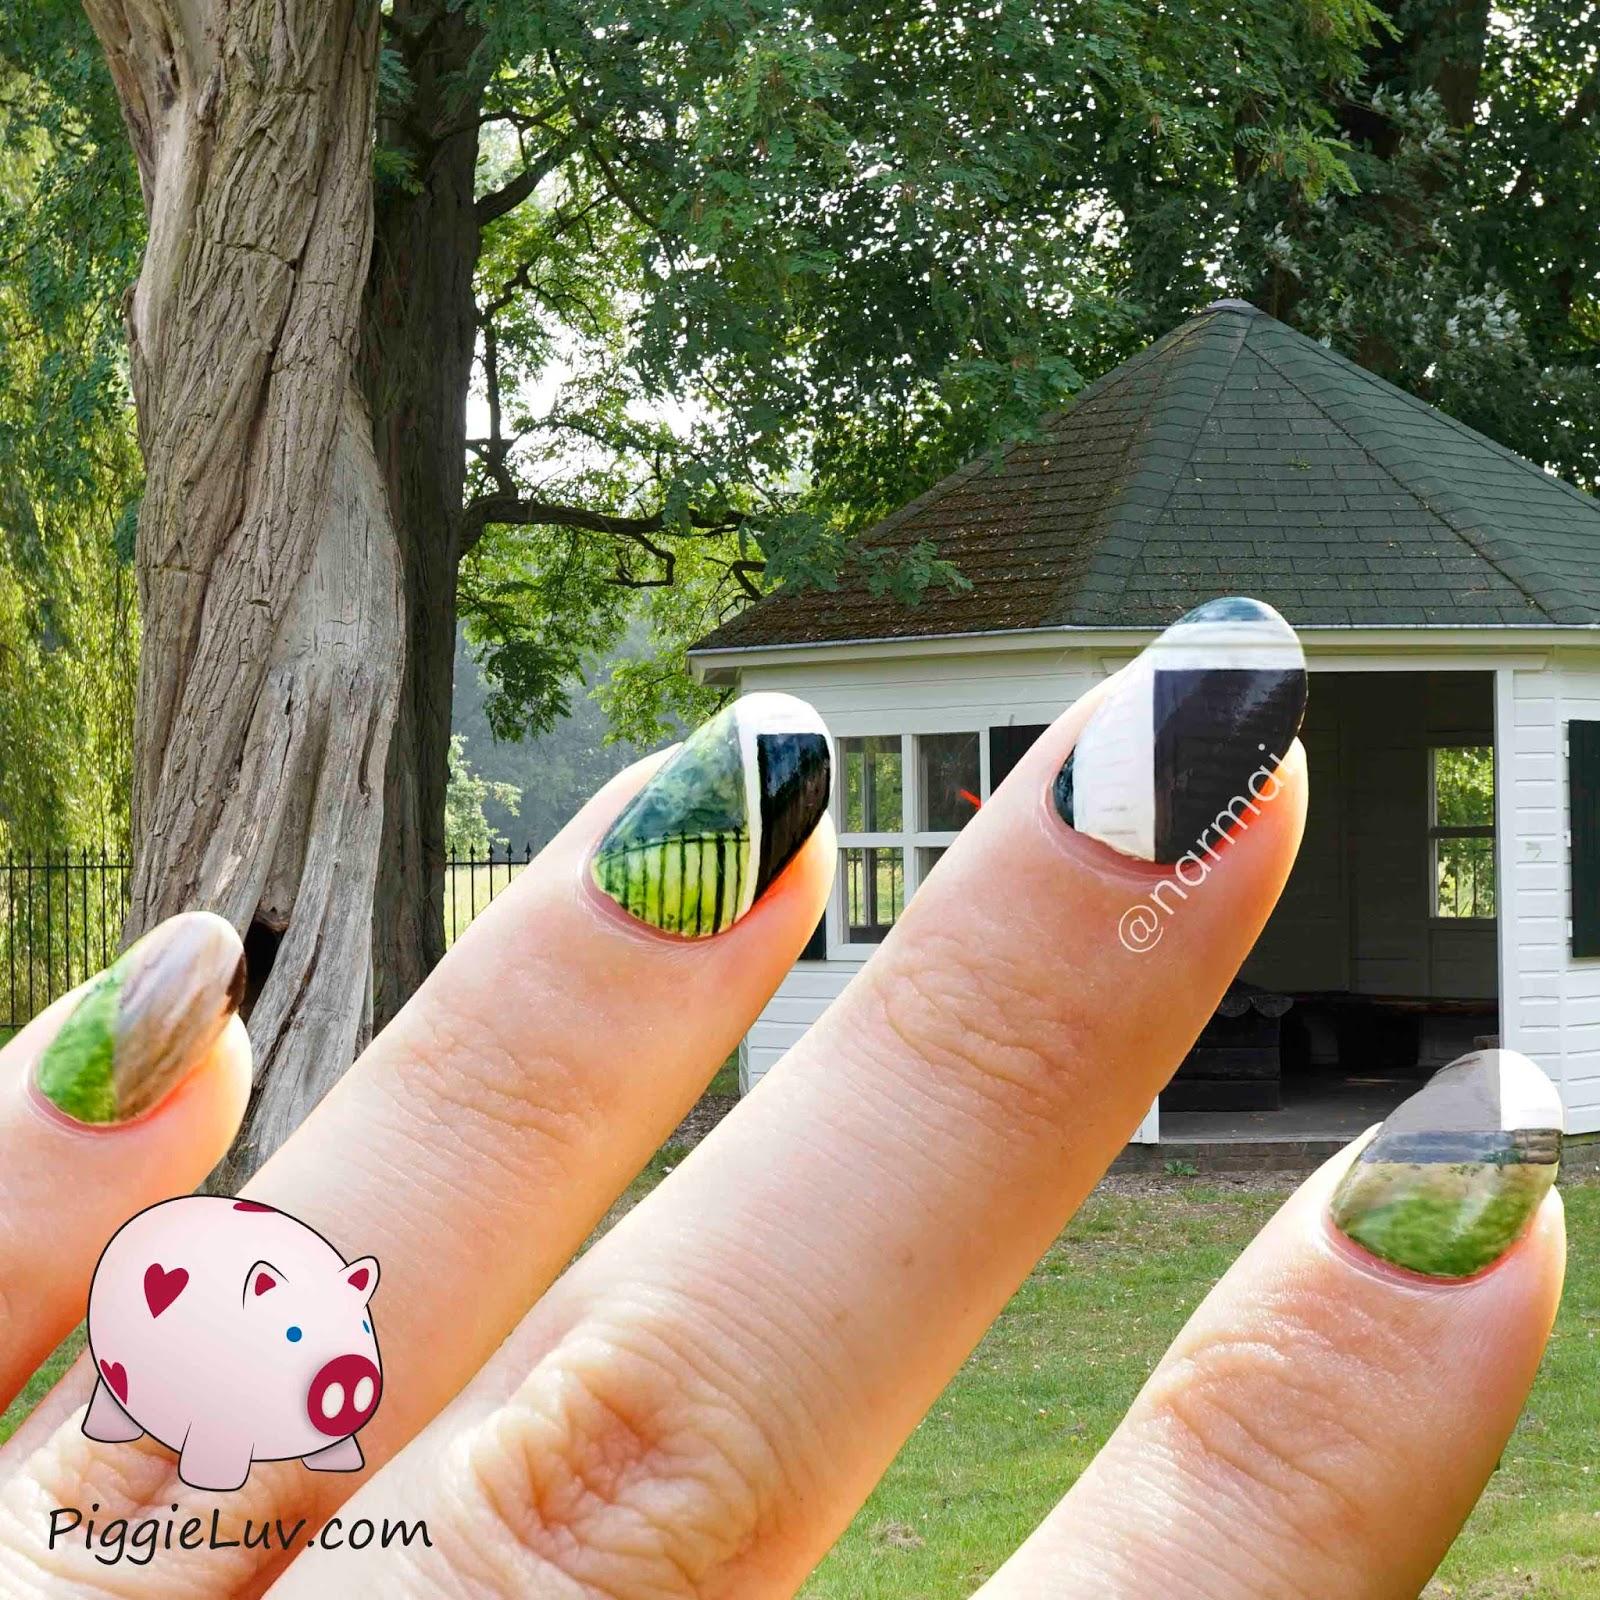 Piggieluv Galaxy Donuts Nail Art: PiggieLuv: Nail Art Gallery